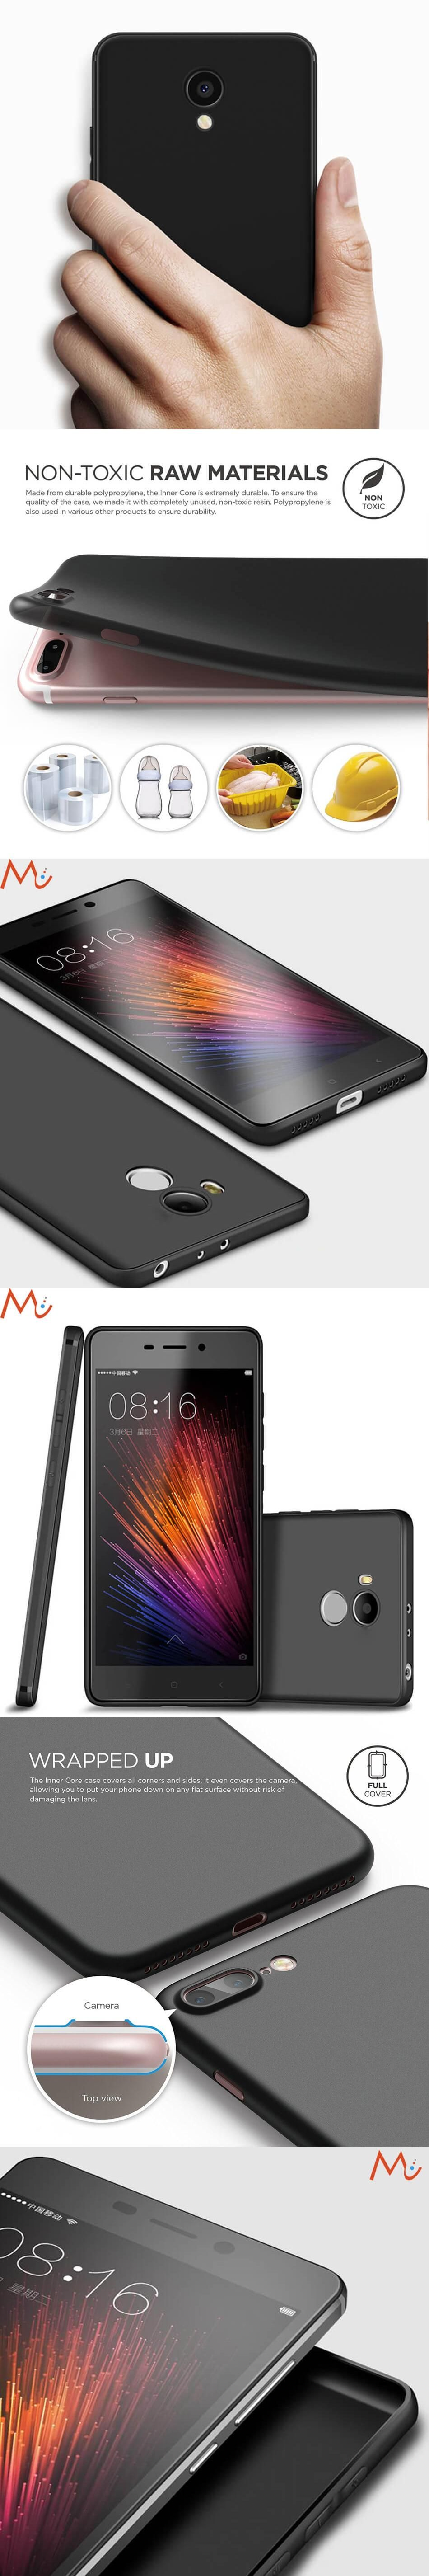 Luxury Thin Case For Xiaomi Redmi 4 Pro Black Matte Soft TPU Silicone Back Cover For